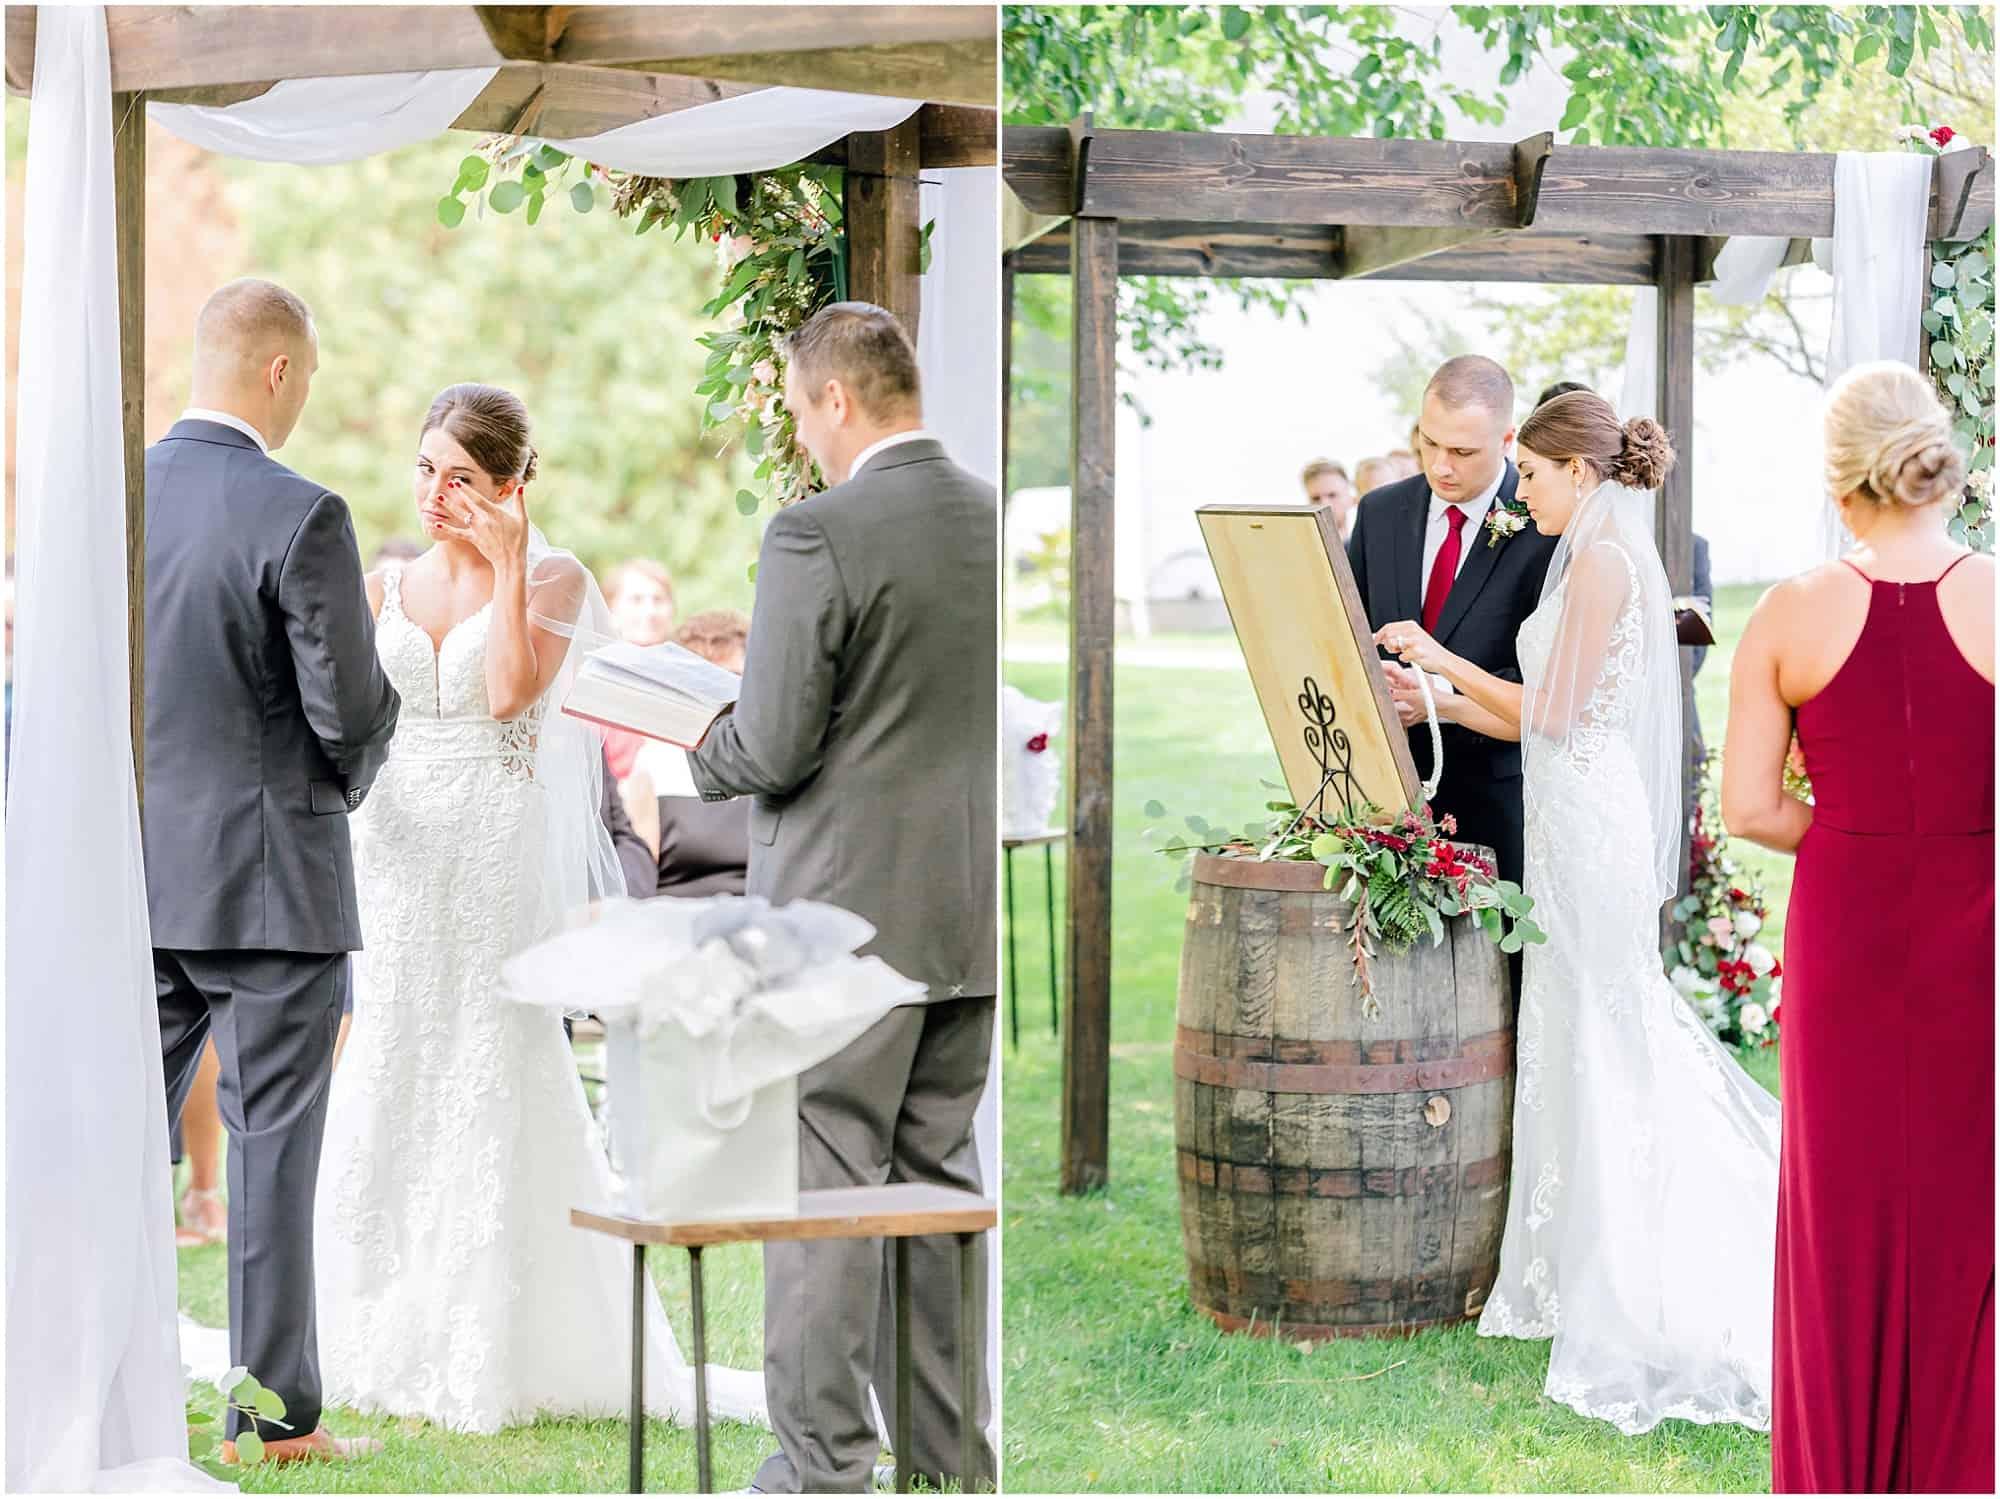 millsite lodge wedding ceremony by sandusky ohio photographer tiffany murray